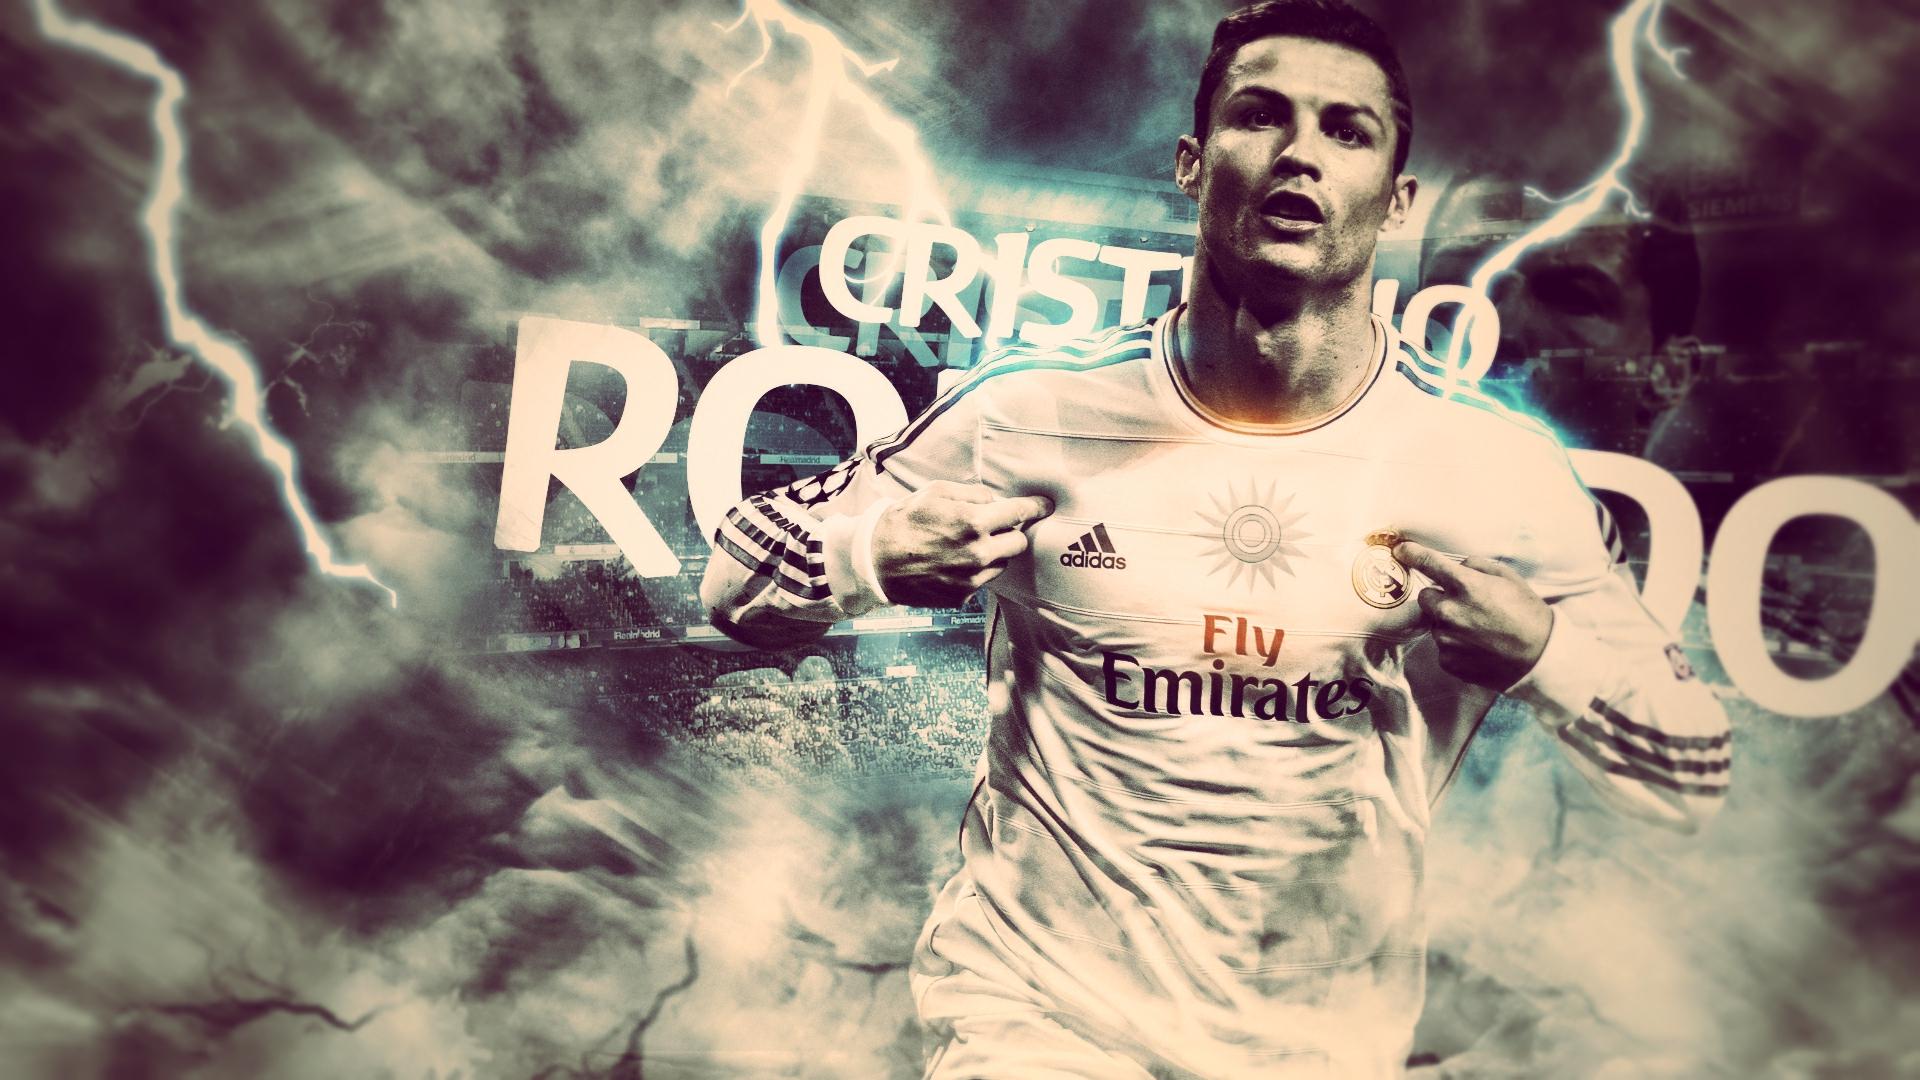 CR7 Ronaldo HD Wallpapers   Football HD Wallpapers 1920x1080